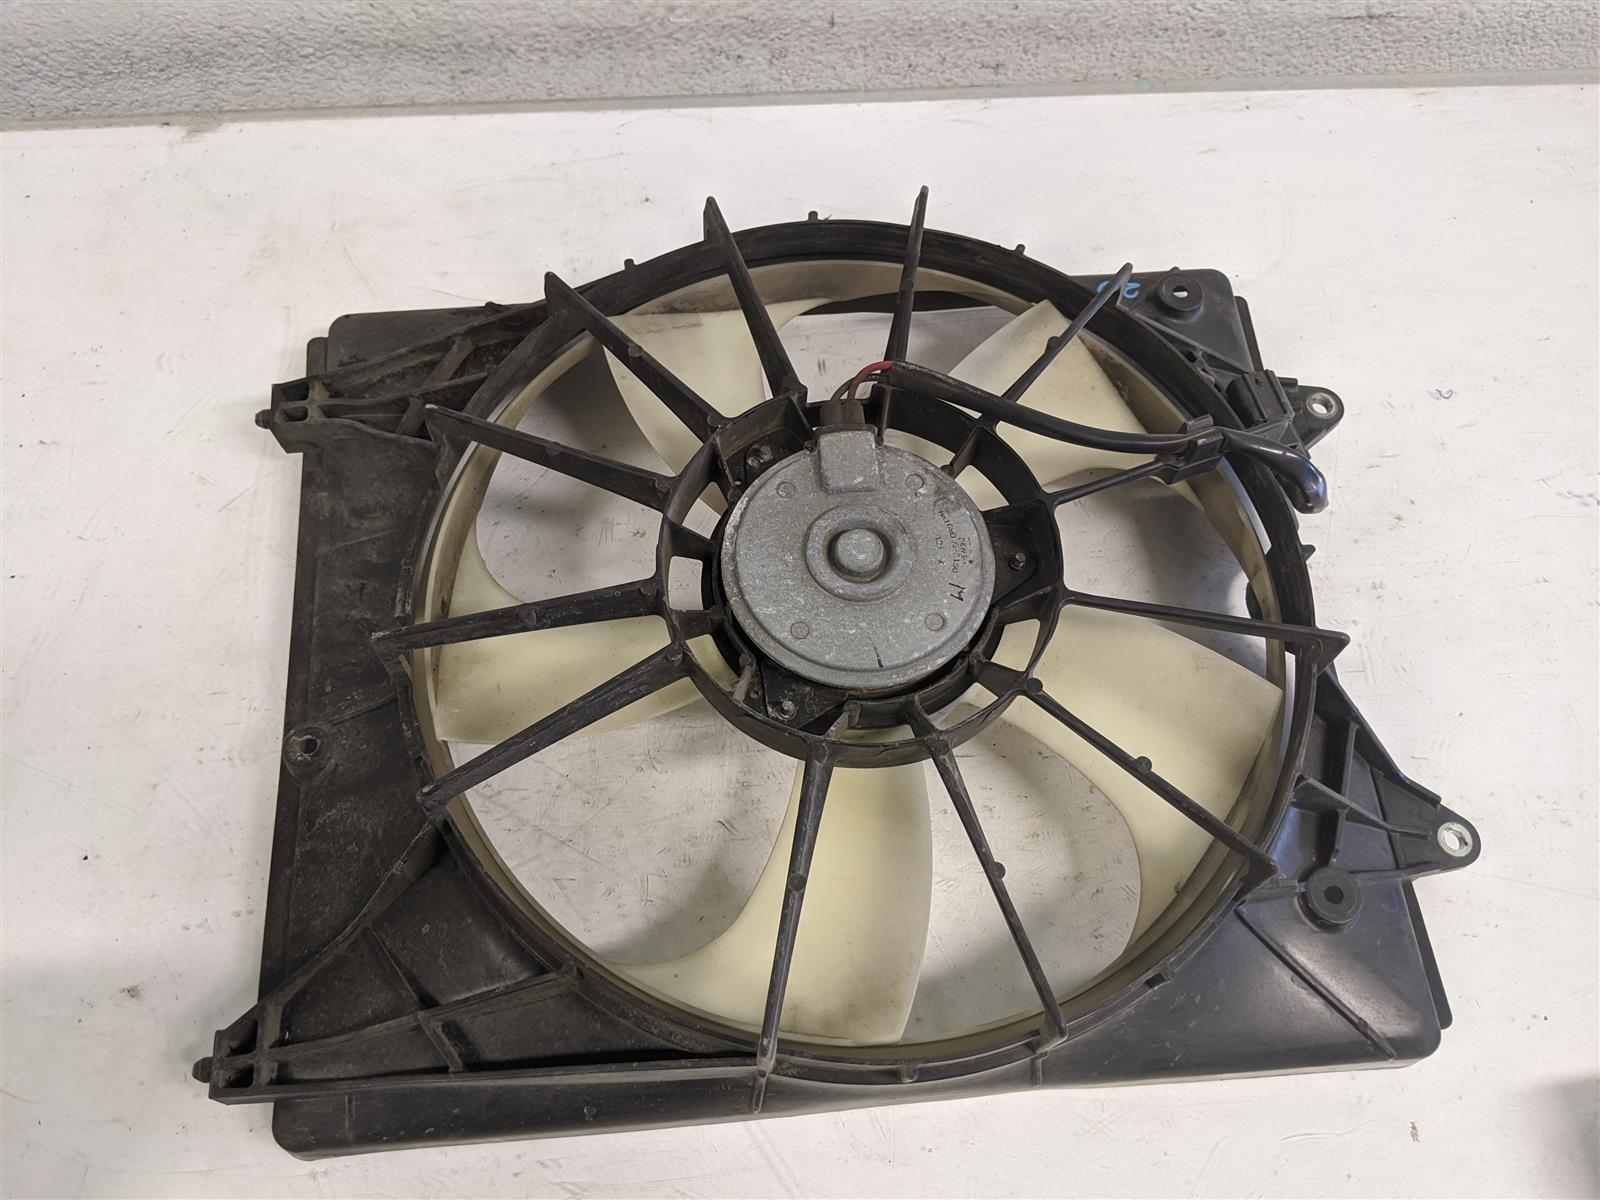 2014 Honda Odyssey Radiator Fan Assembly Replacement